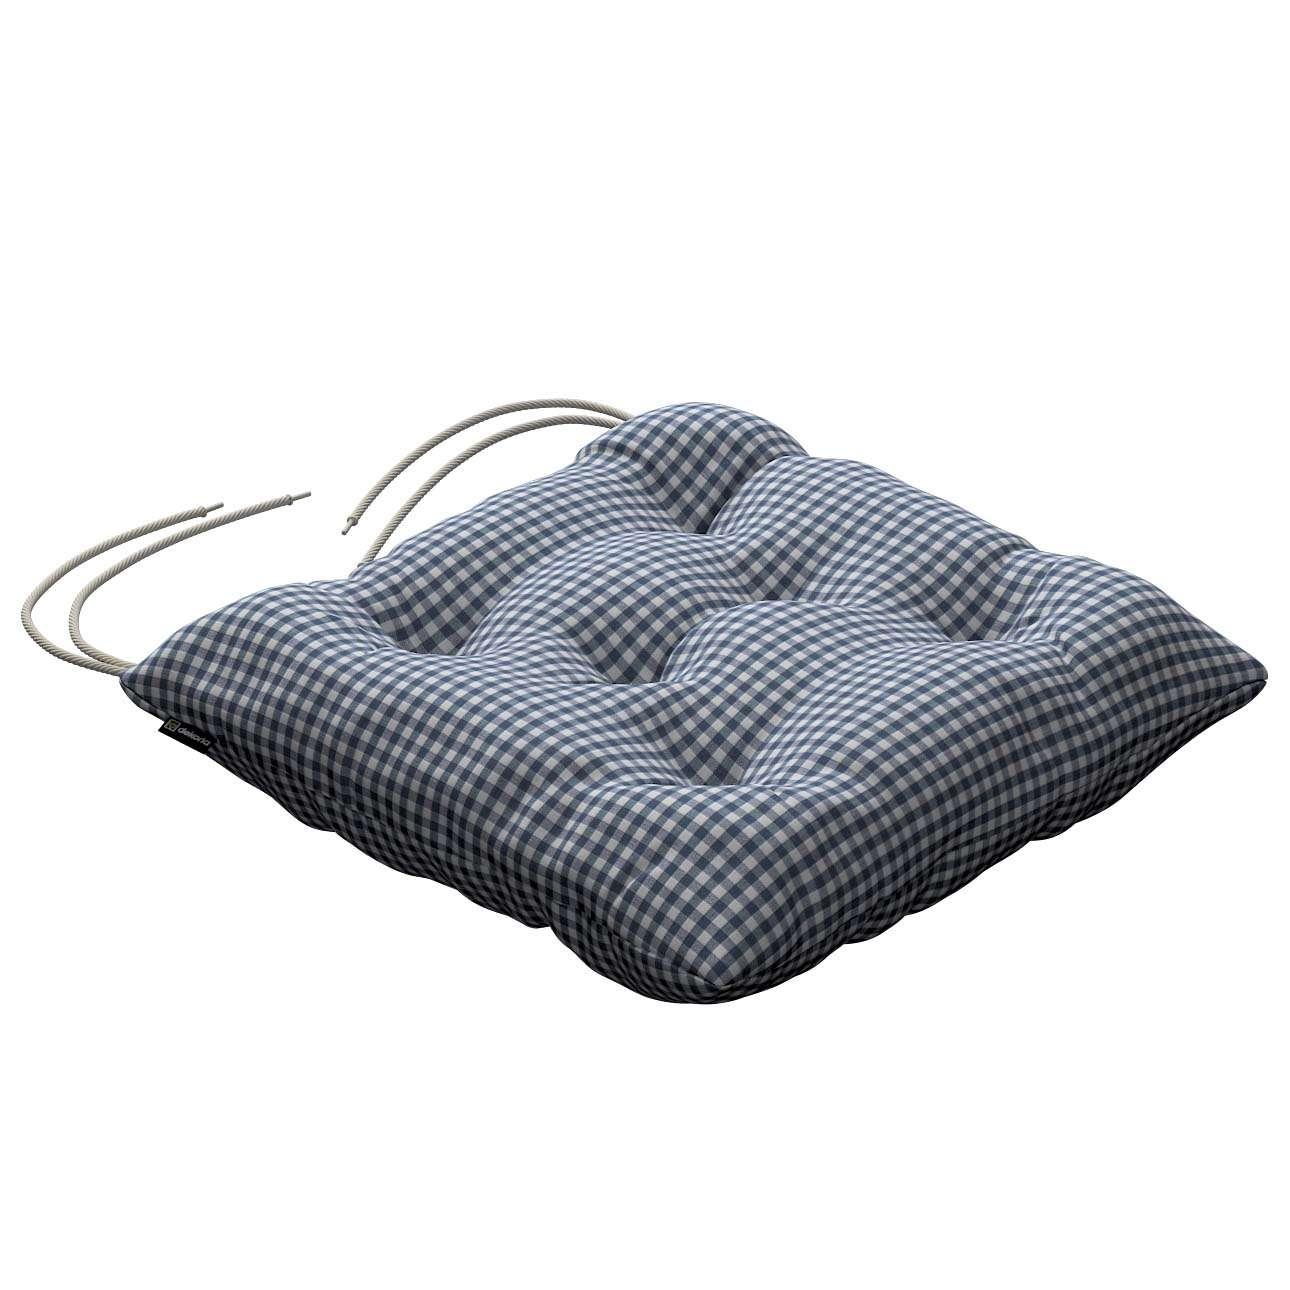 Kėdės pagalvėlė Jacek  40 x 40 x 8 cm kolekcijoje Quadro, audinys: 136-00